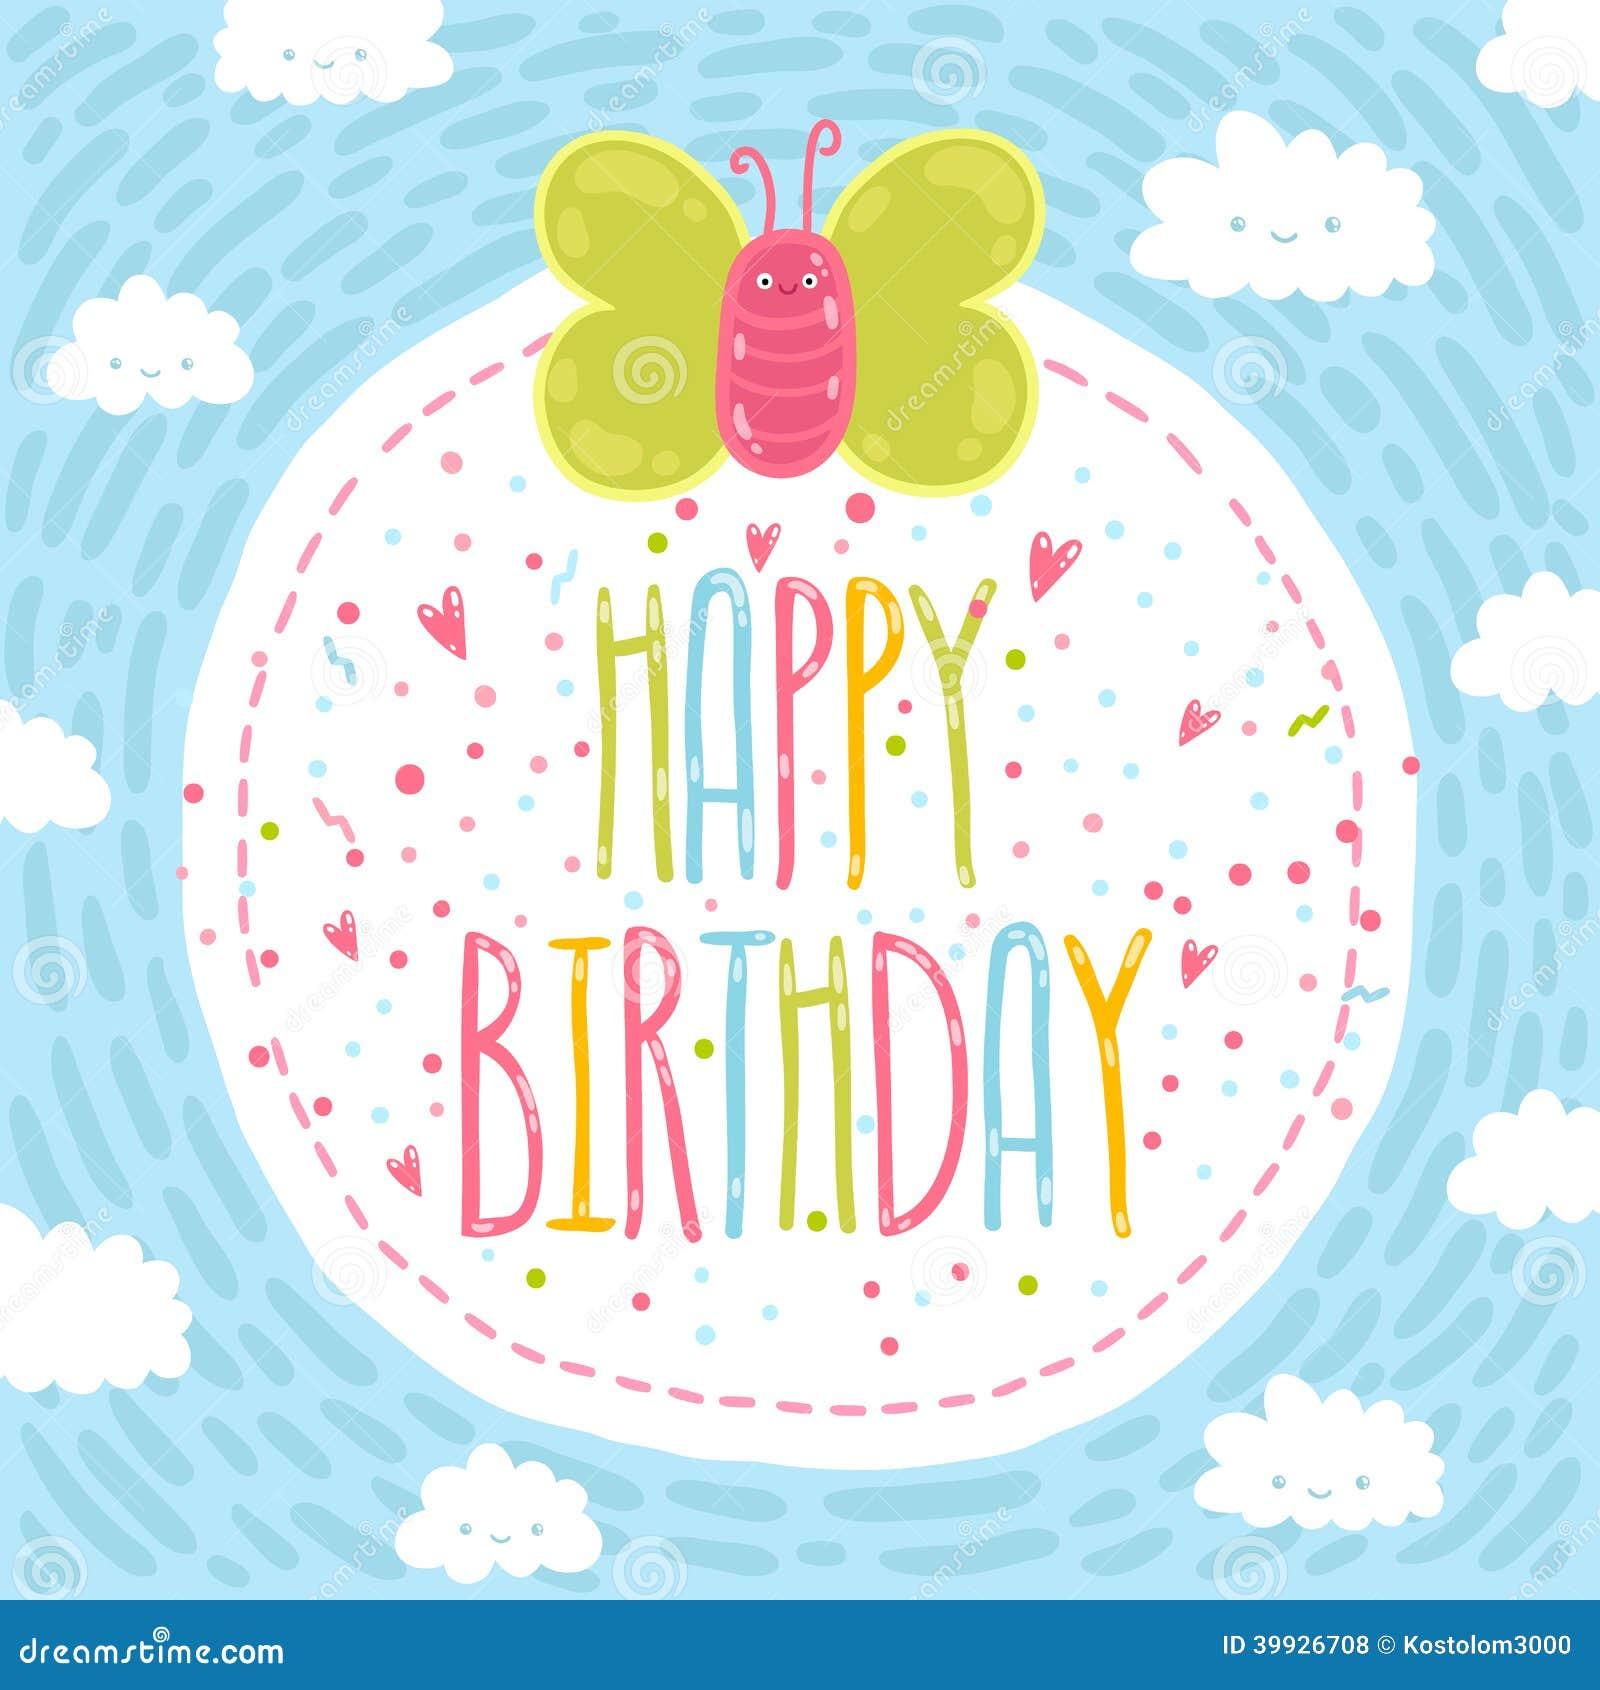 happy birthday text message art